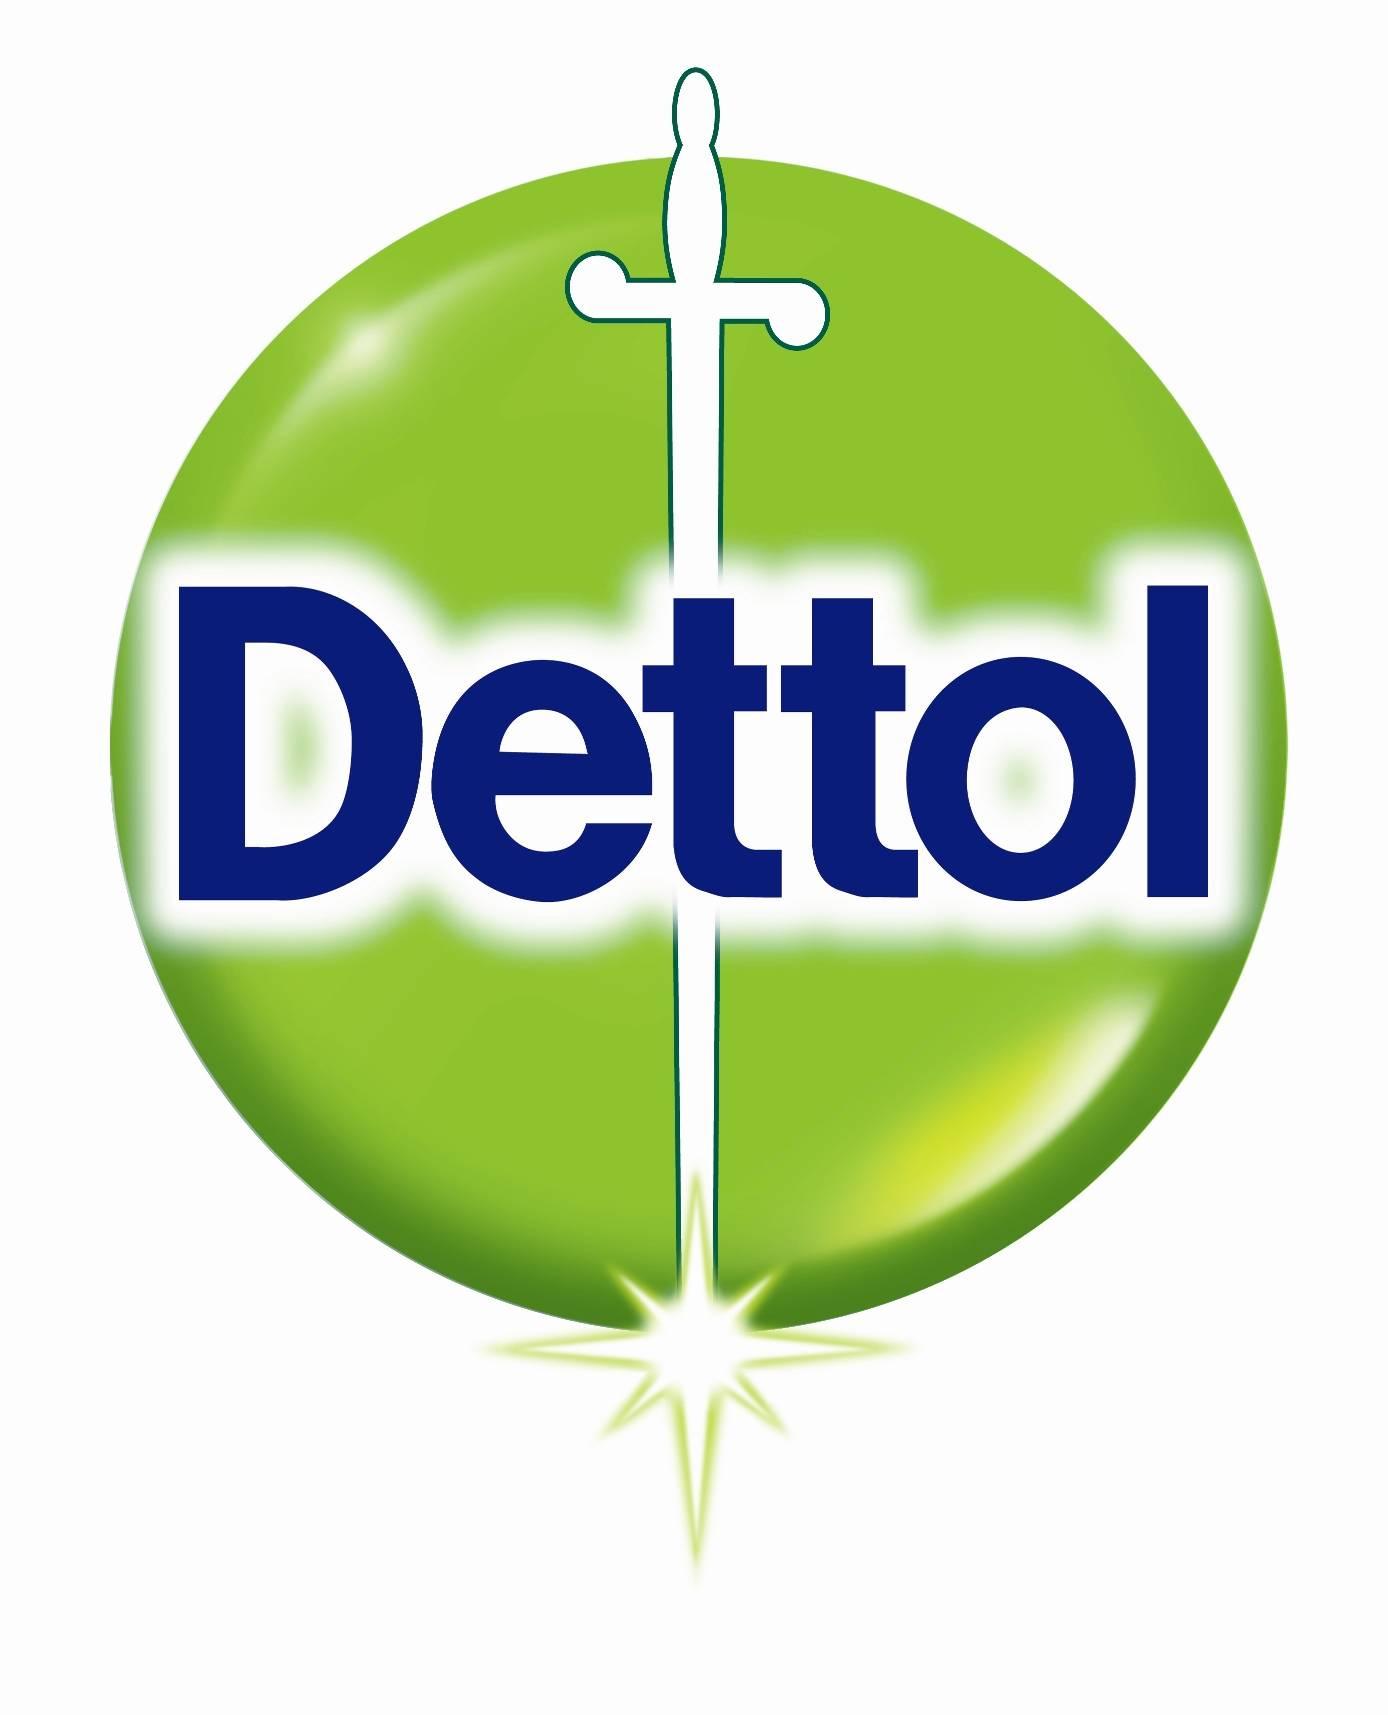 Using Dettol when pregnant